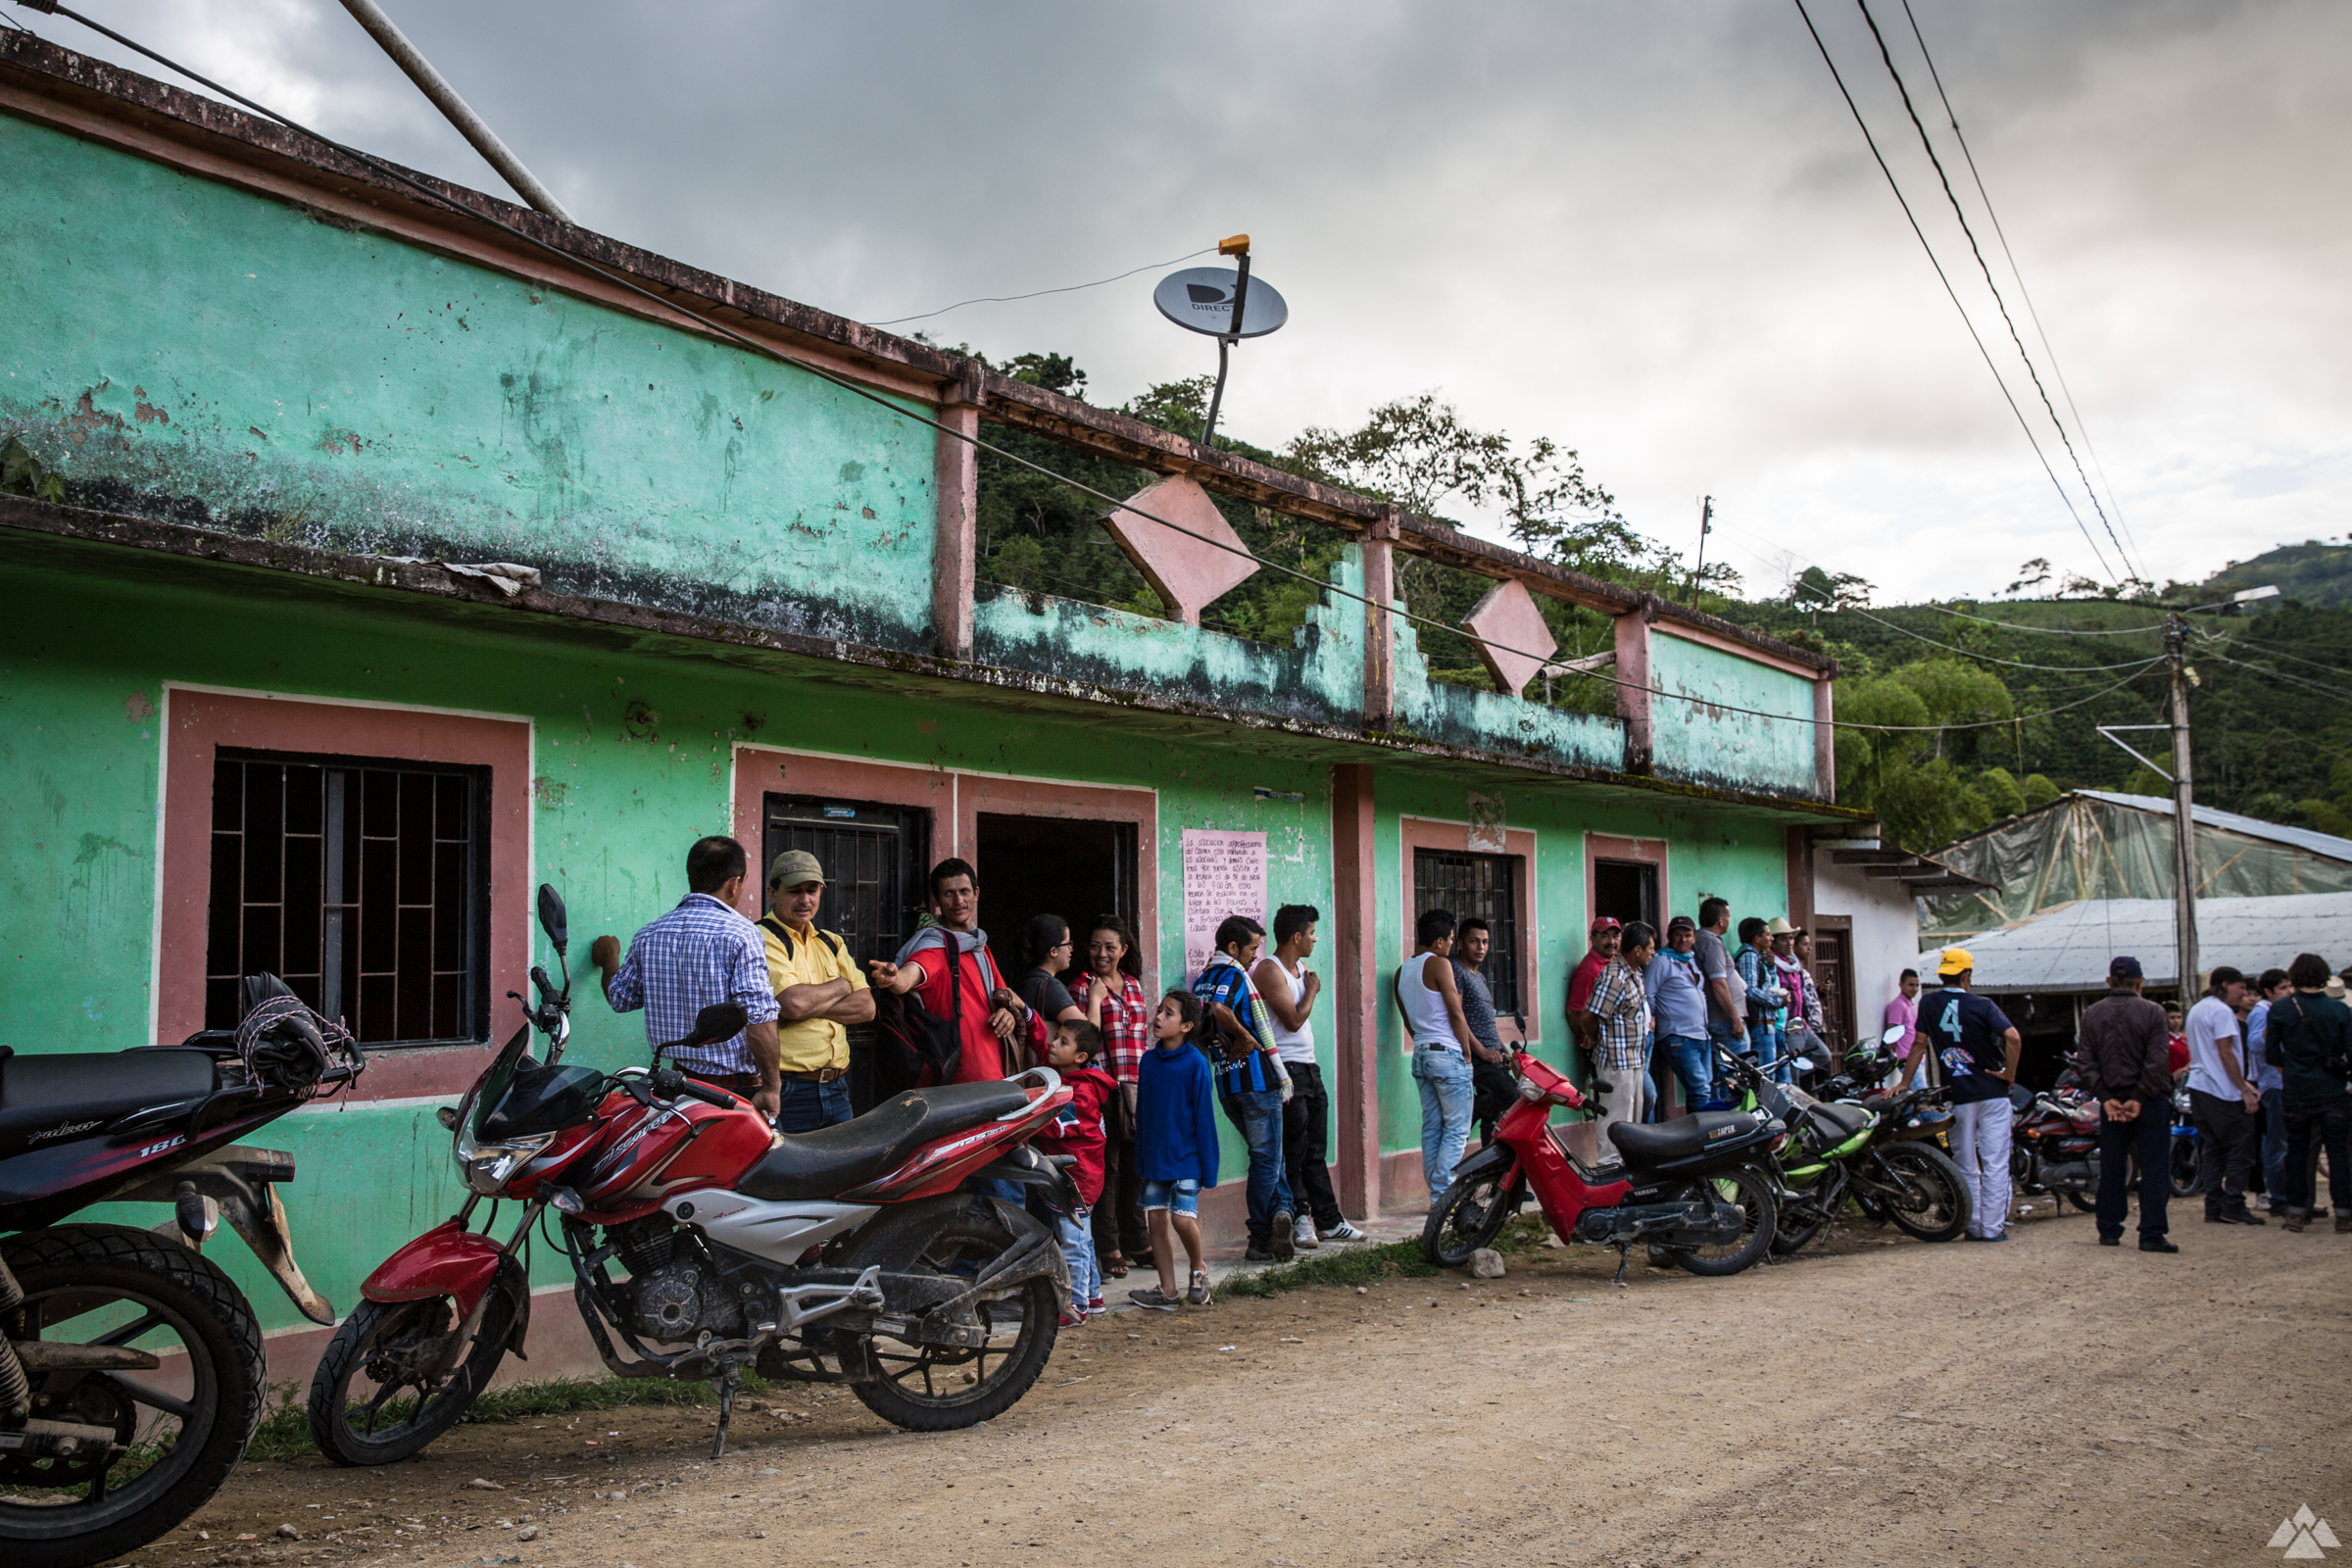 Colombia Nov 2017-34.jpg